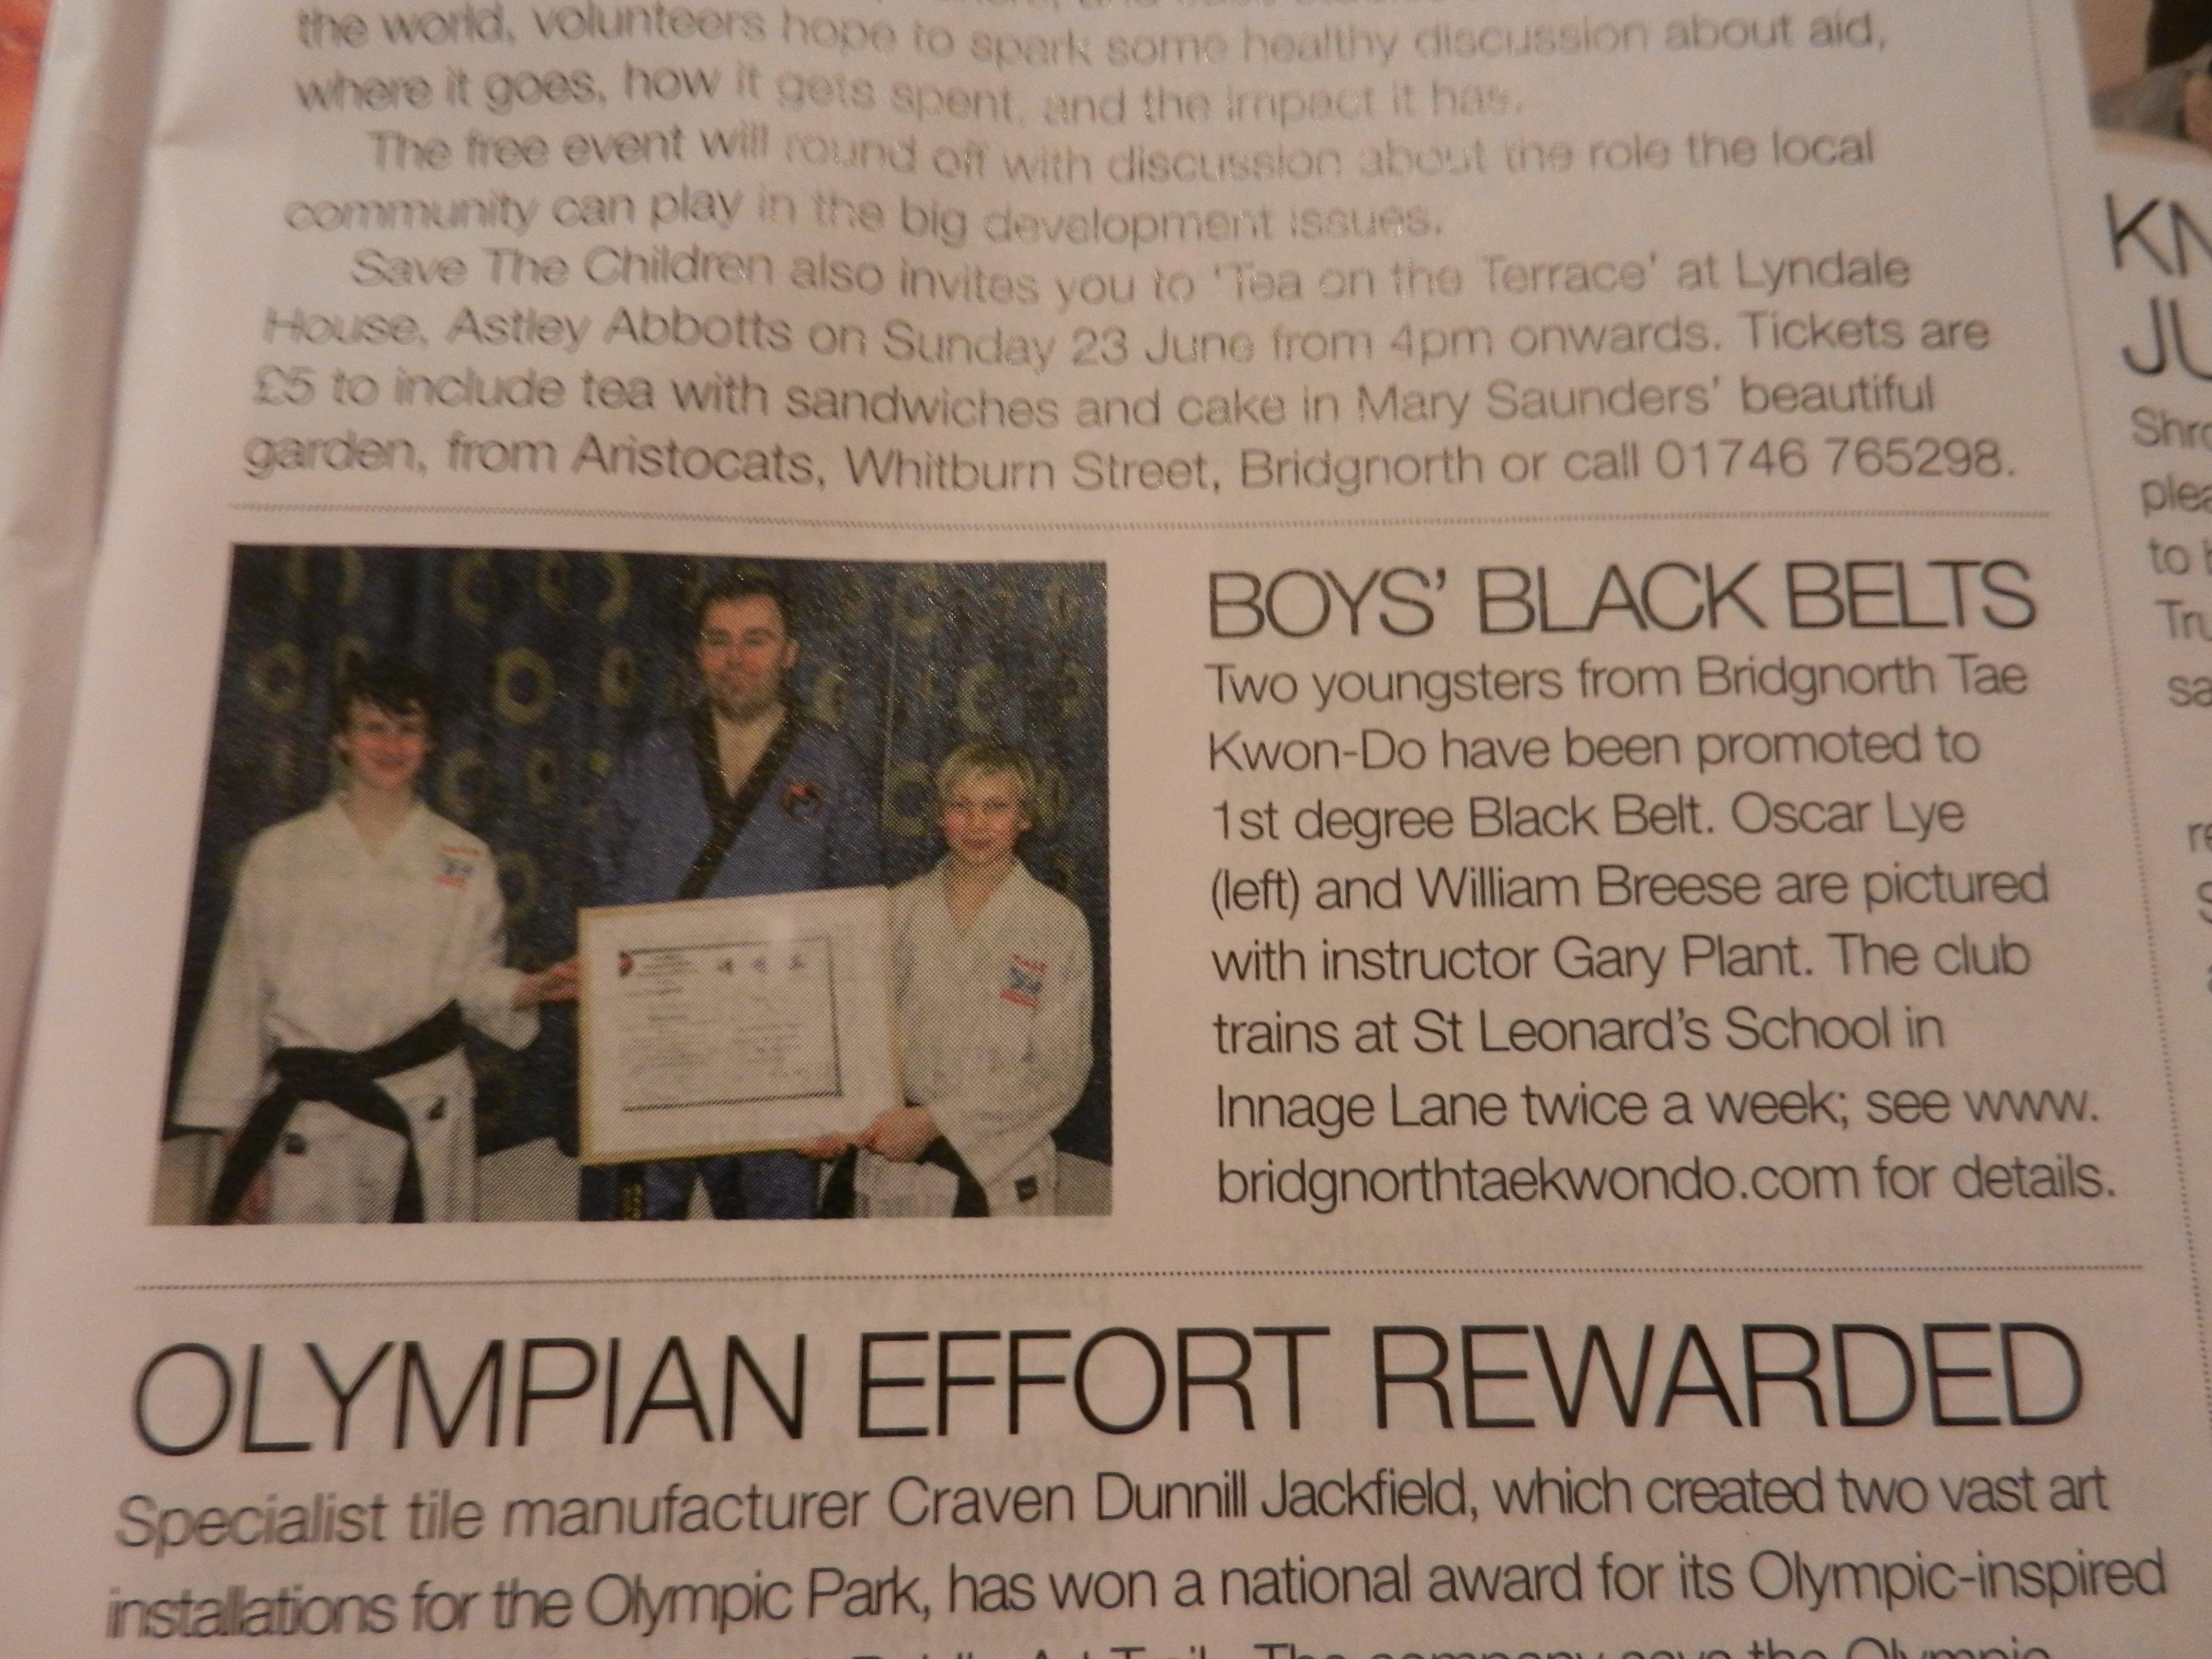 Celebrating Junior Black Belts: Shropshire Review, June 2013